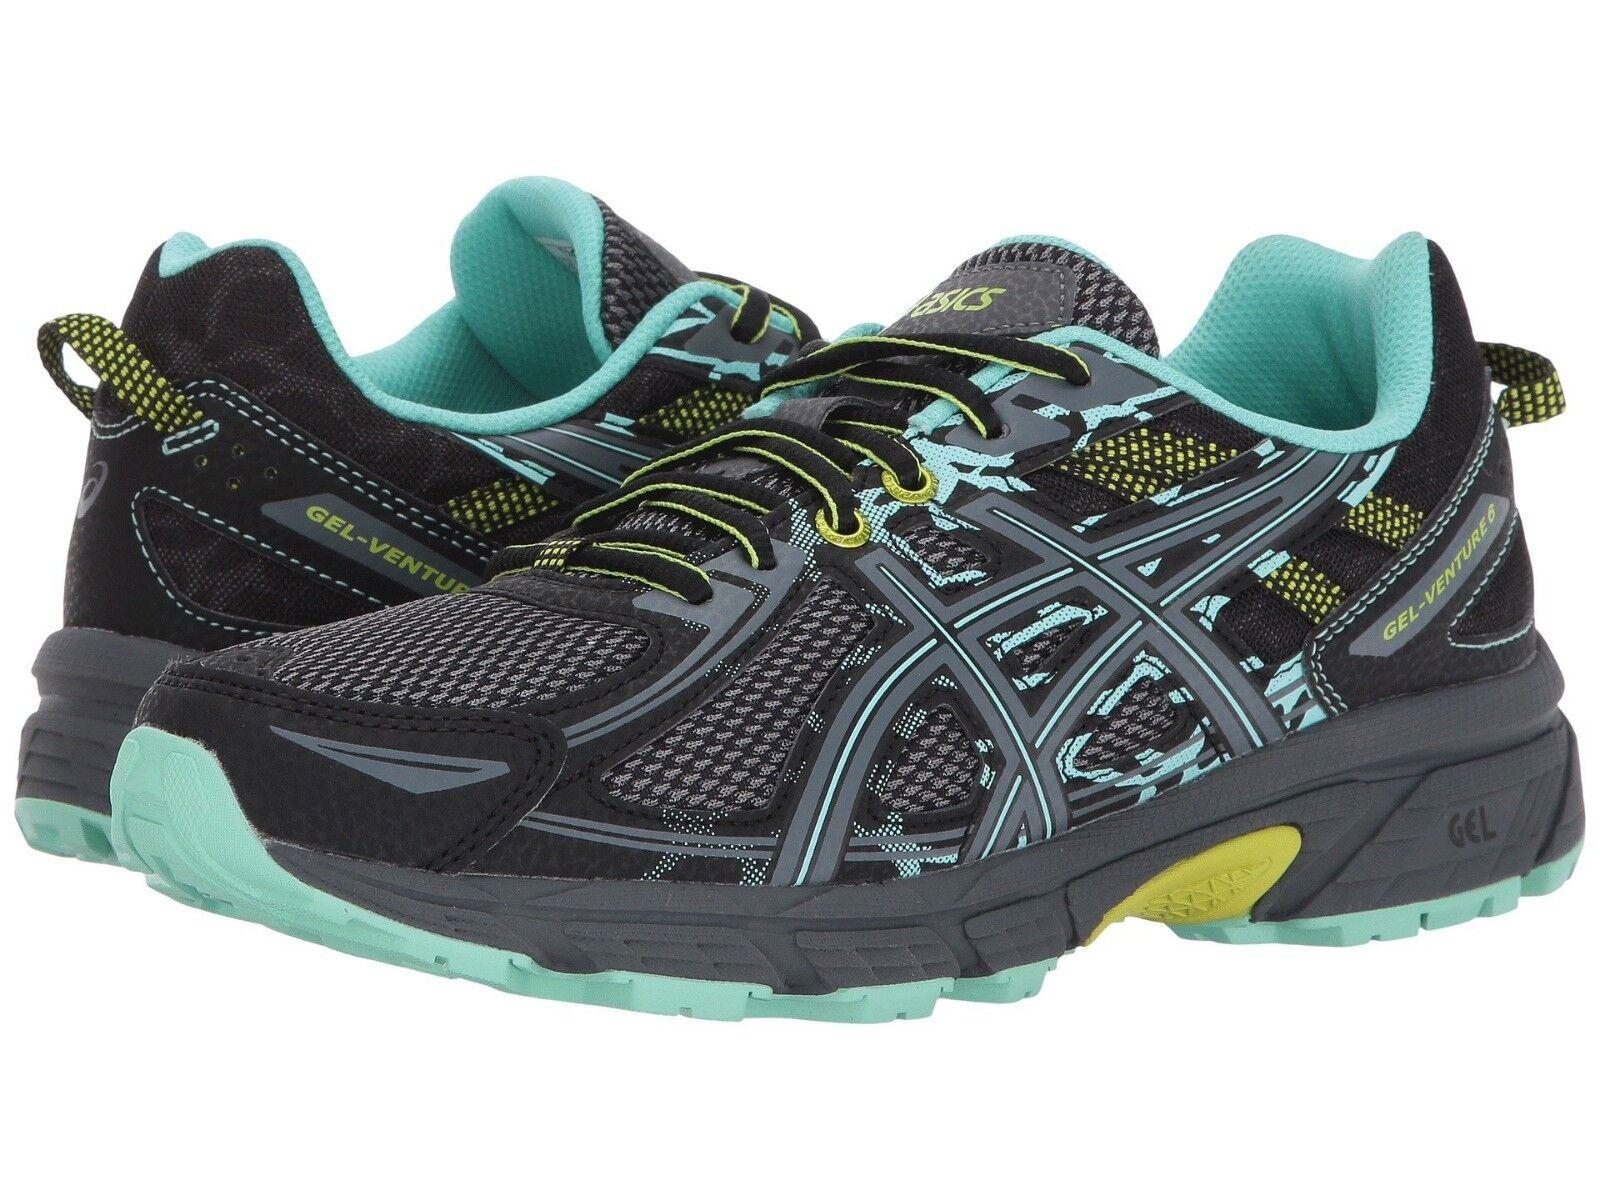 Nuevo en caja para Mujeres Asics Gel-Venture ® 6 Trail Running Zapatos B & D Ancho BK Cal 412 510